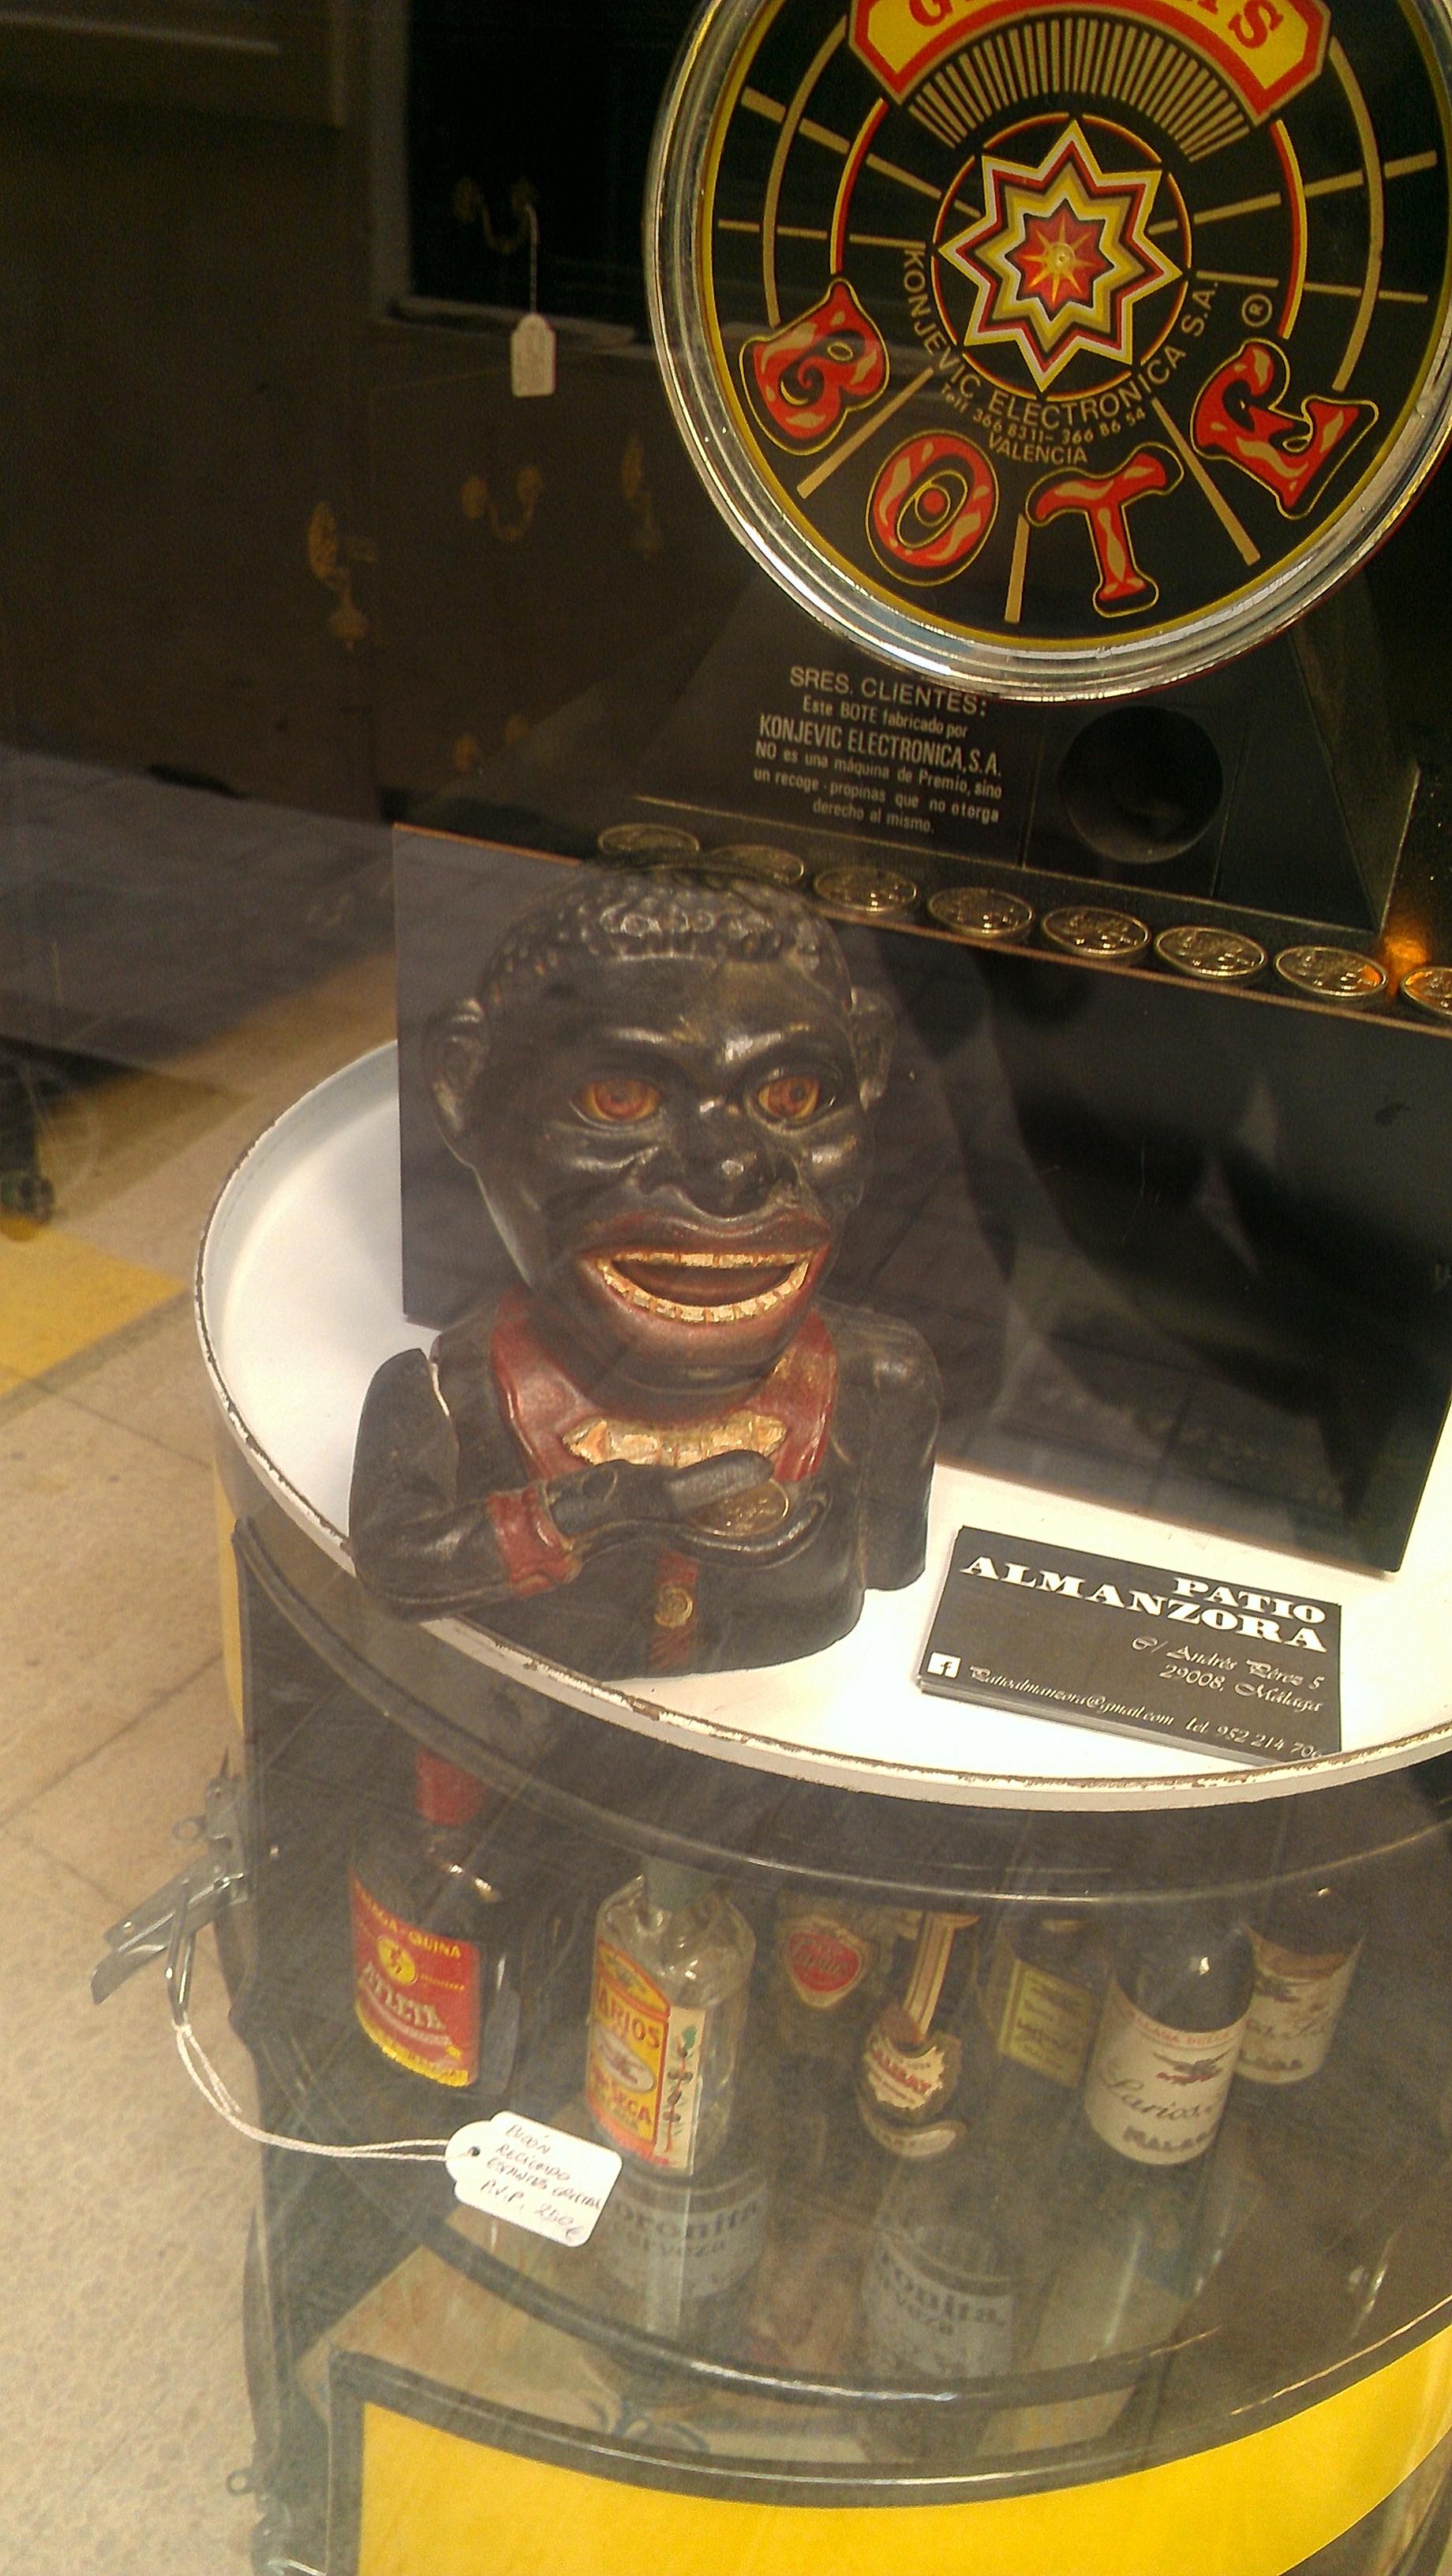 'black sambo' figurine on display in a vintage curiosity shop - Malaga